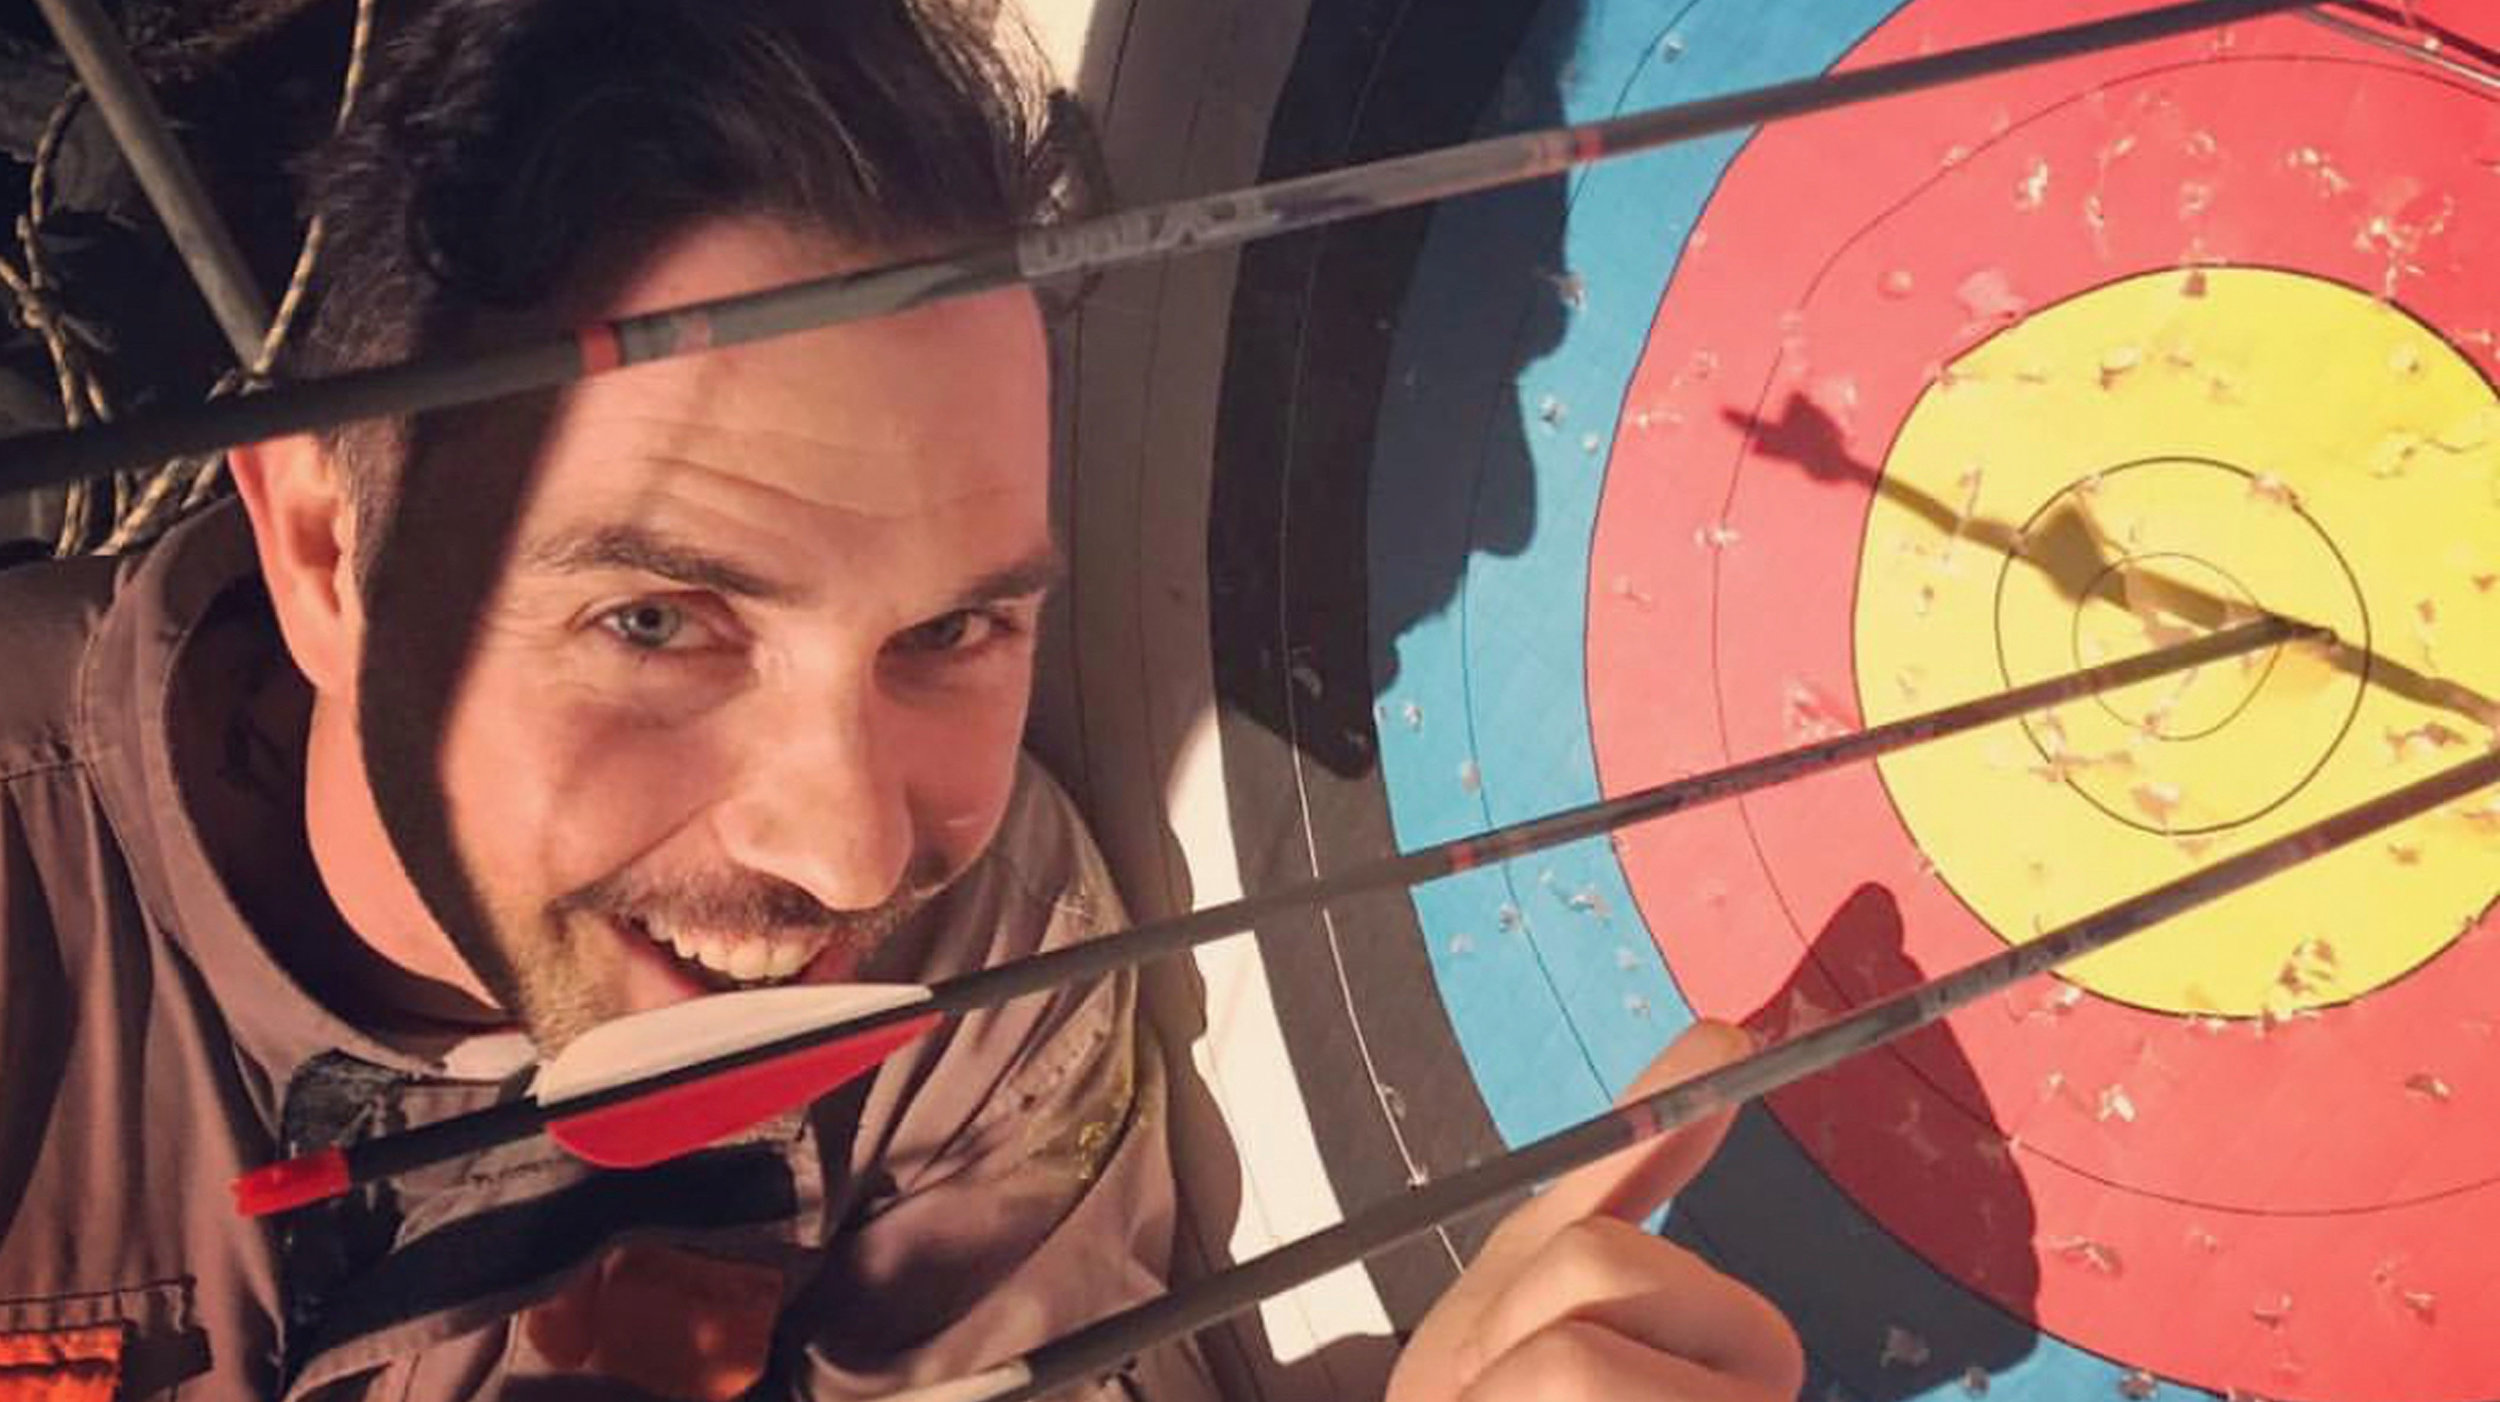 Archery - 15 minutes